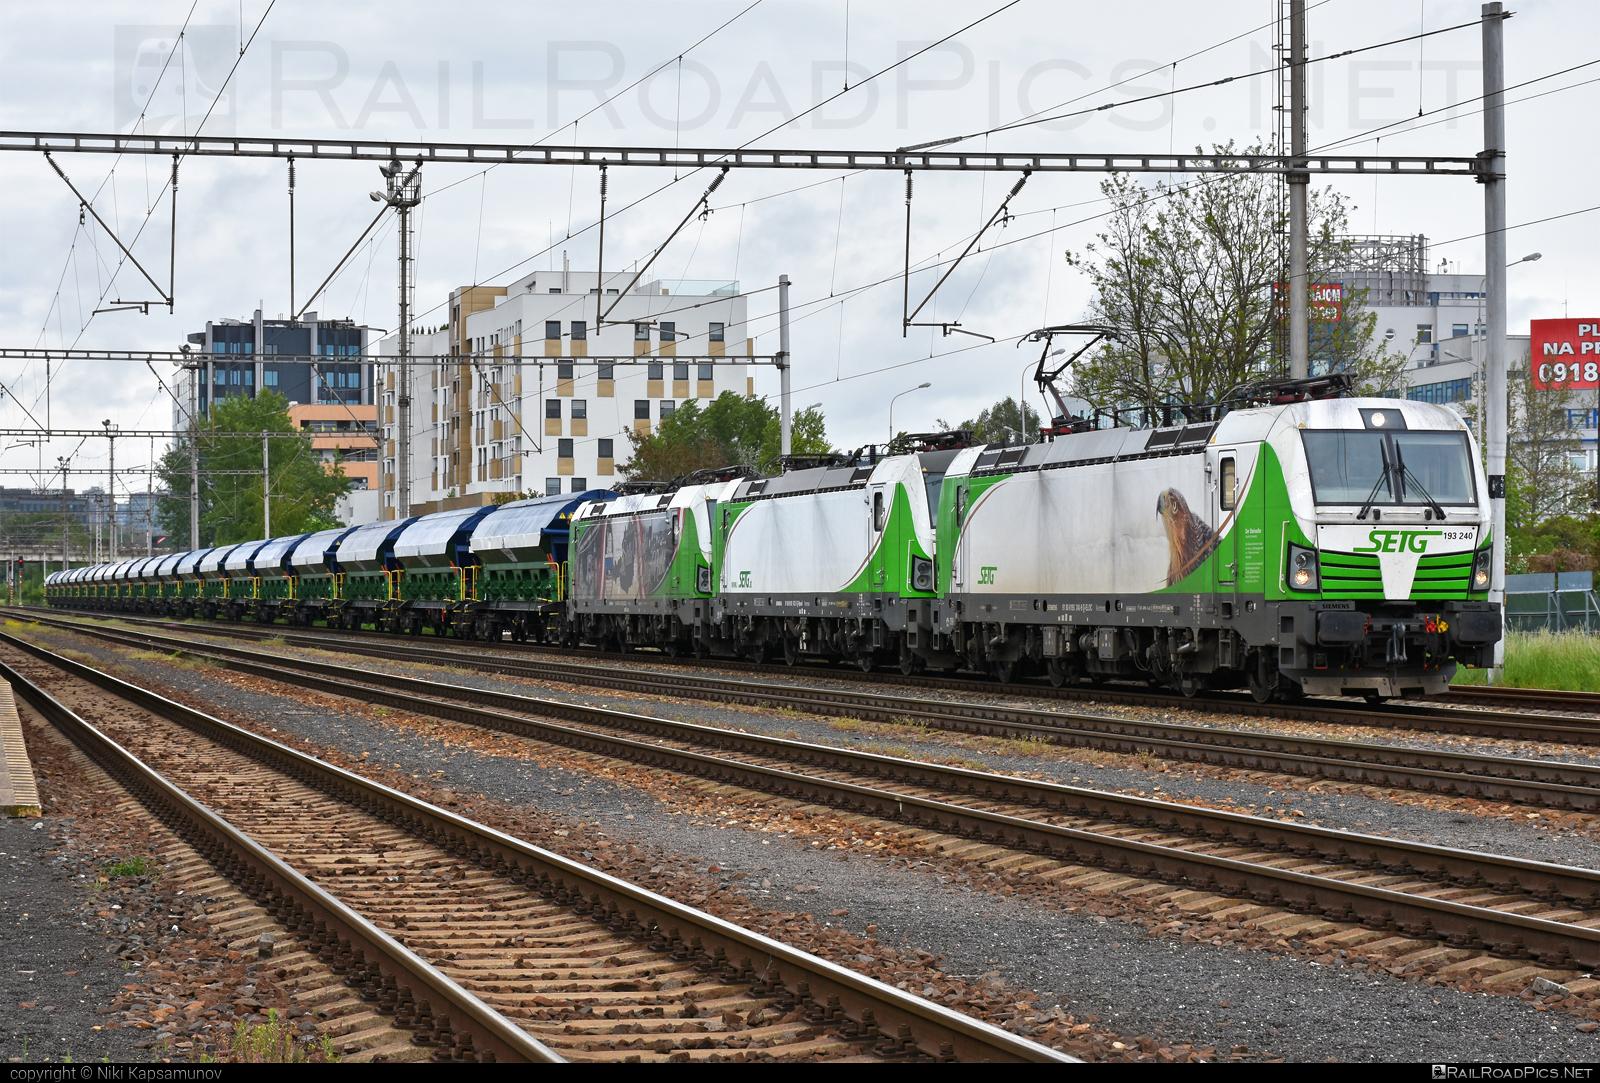 Siemens Vectron AC - 193 240 operated by Salzburger Eisenbahn Transportlogistik GmbH #SalzburgerEisenbahnTransportlogistik #SalzburgerEisenbahnTransportlogistikGmbH #ell #ellgermany #eloc #europeanlocomotiveleasing #hopperwagon #setg #siemens #siemensvectron #siemensvectronac #vectron #vectronac